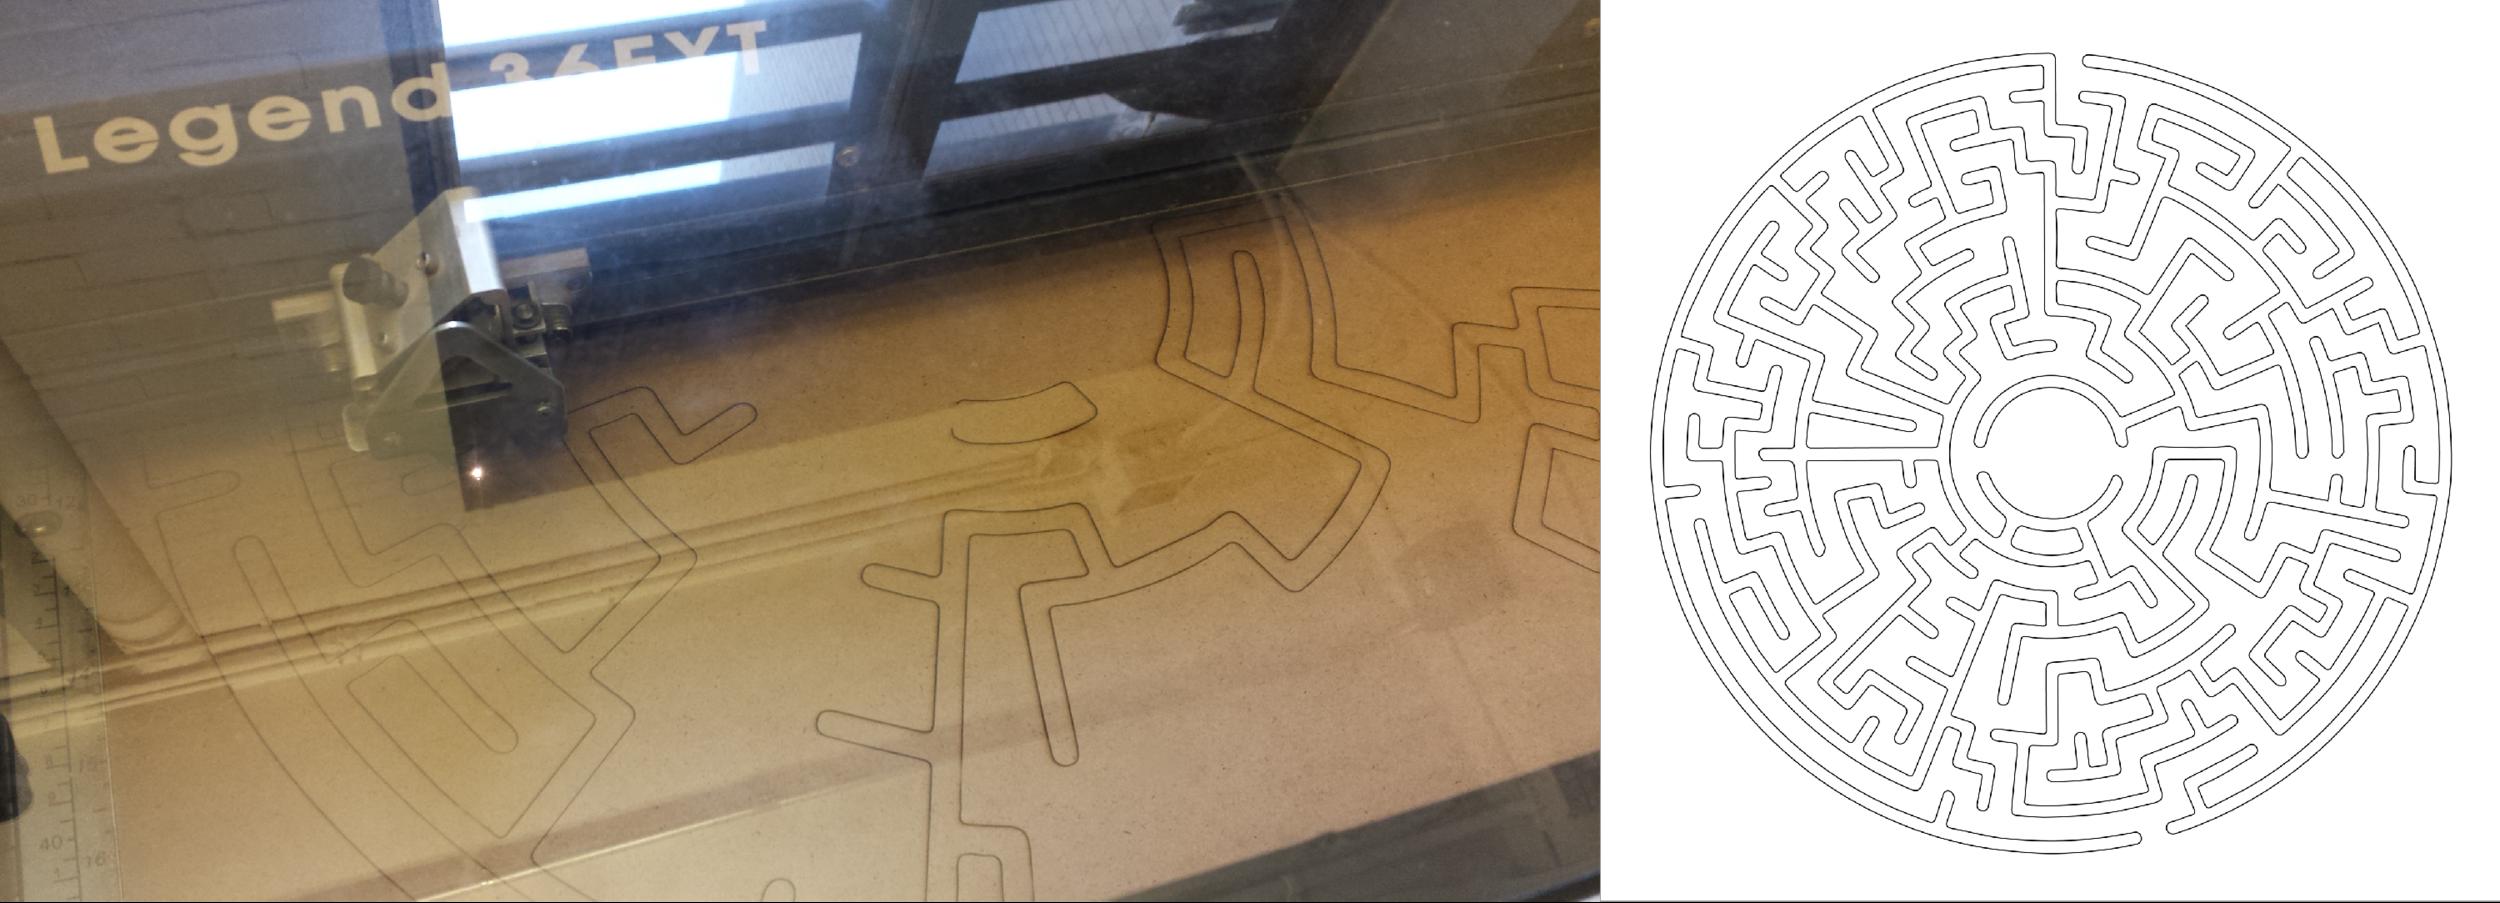 Laser cutting the maze